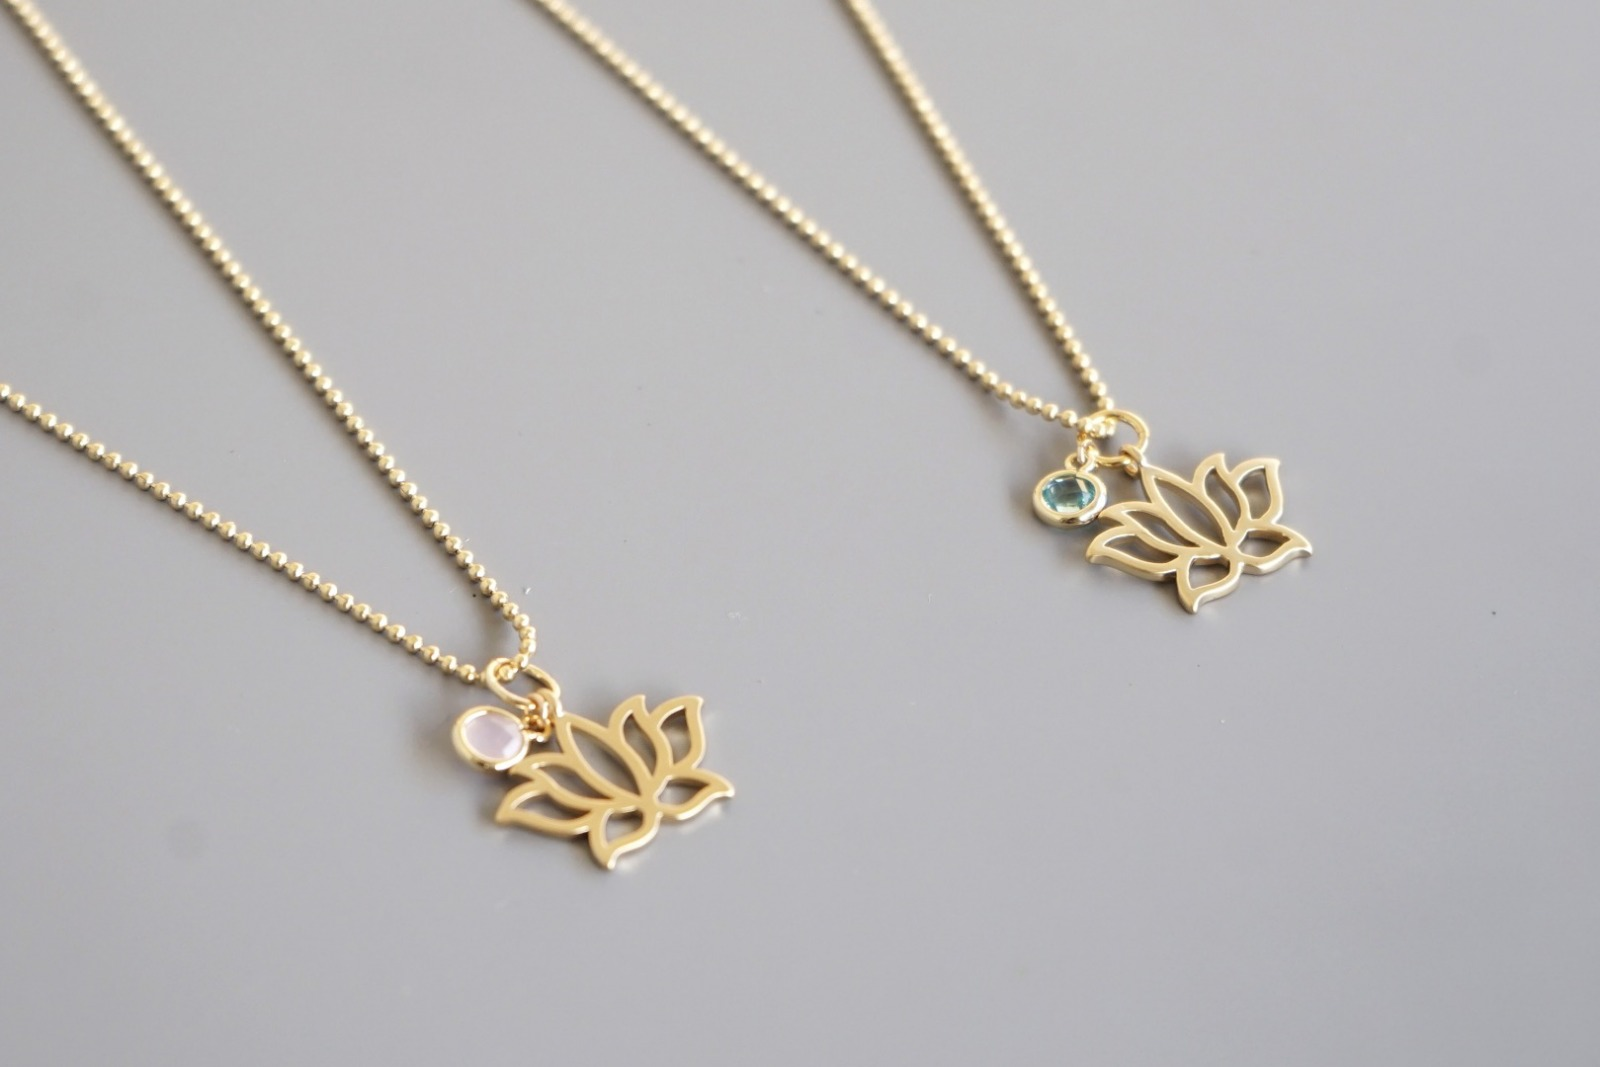 Kugelkette mit Lotusblüte und Kristall rosa - 3